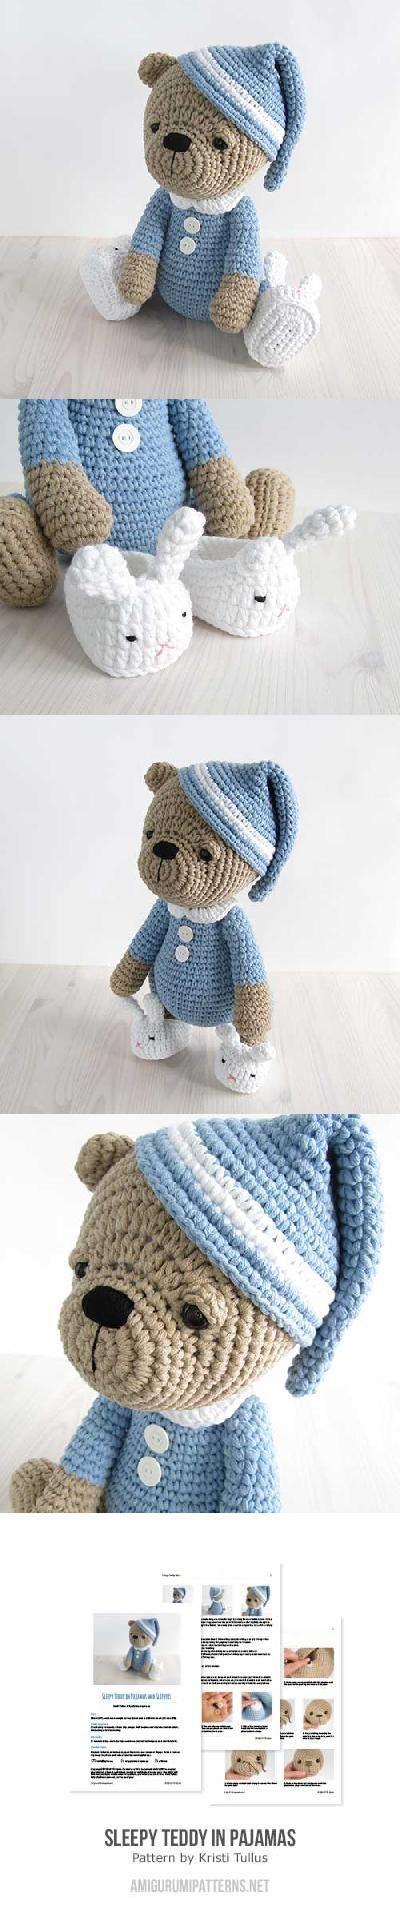 Sleepy teddy in pajamas amigurumi pattern by Kristi Tullus | Oso de ...